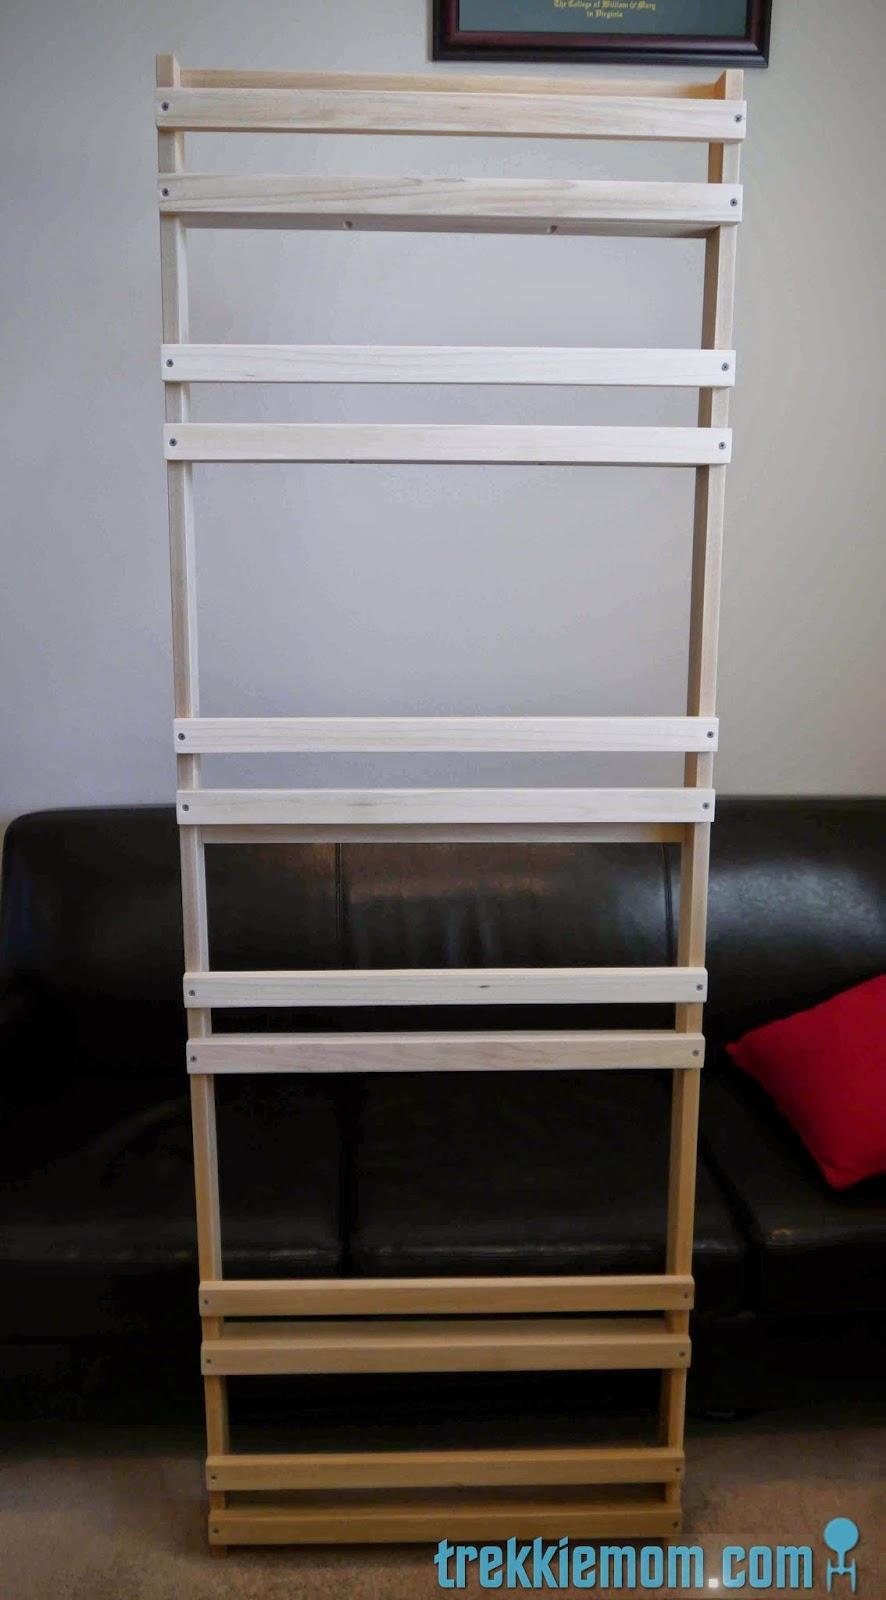 Trekkie Mom: Flat Book Shelf How-to